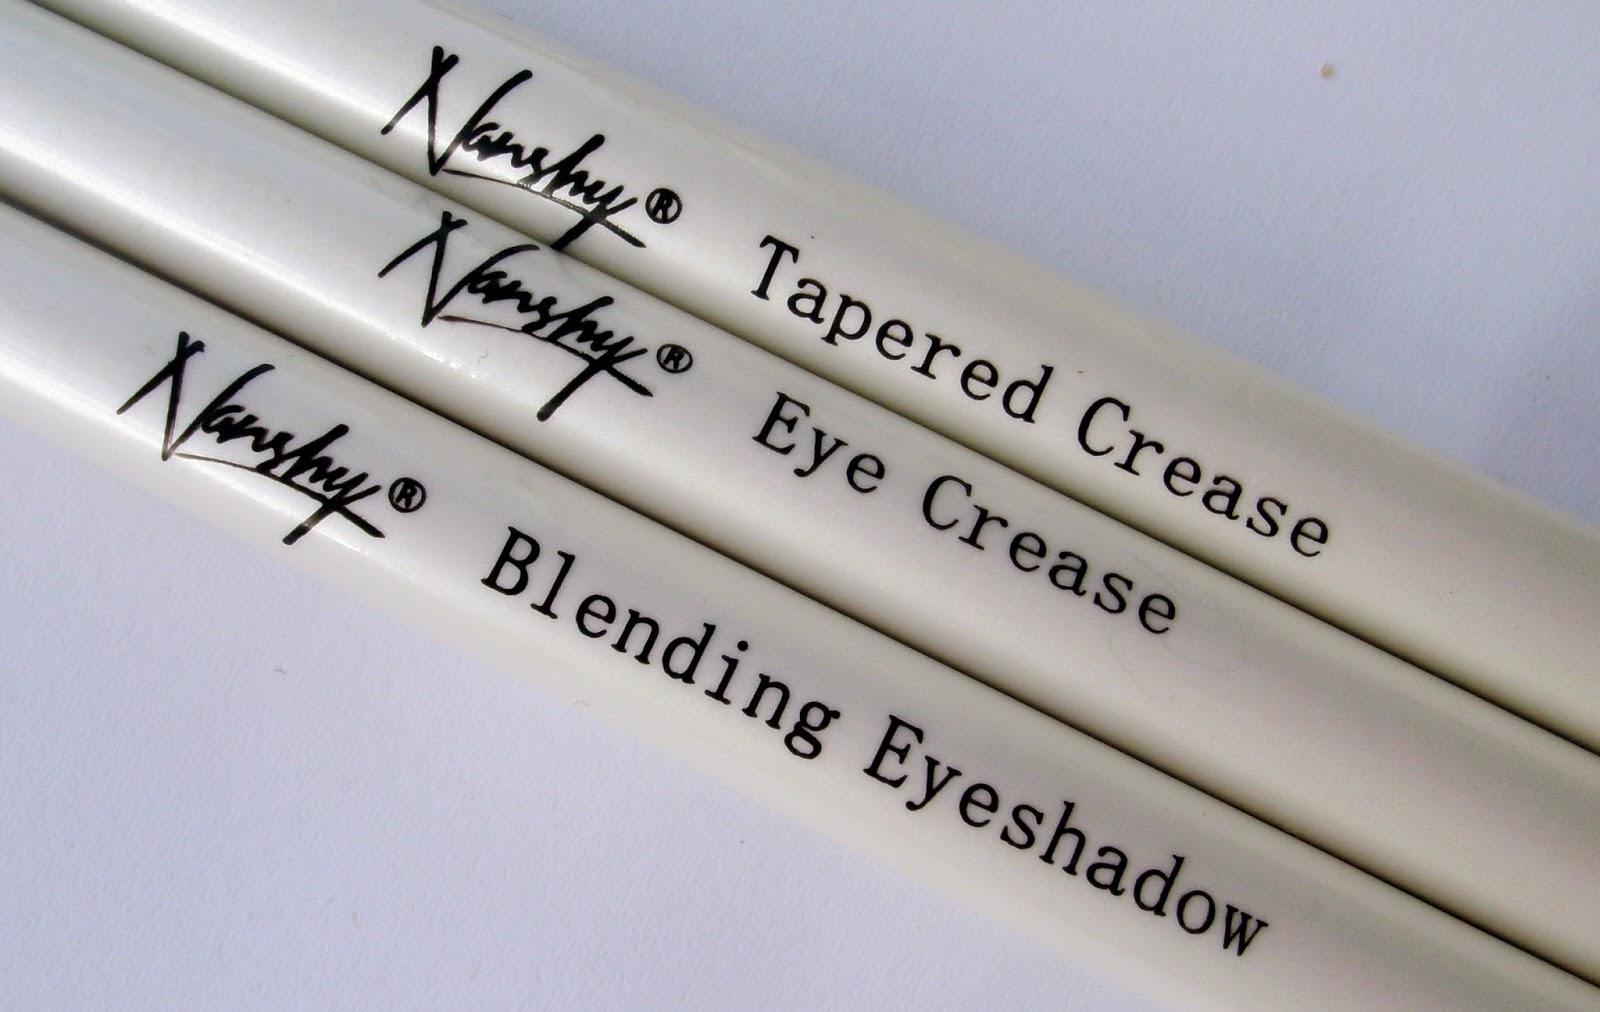 Nanshy Eye Makeup Brushes - Names and Purpose